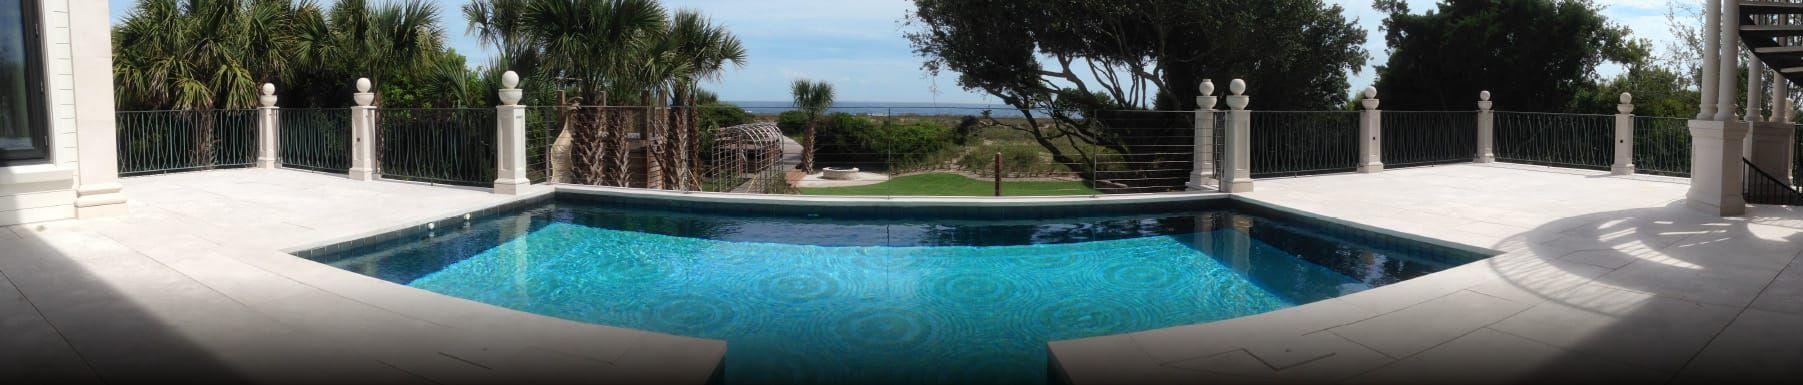 Beachfront Home Sets Trend